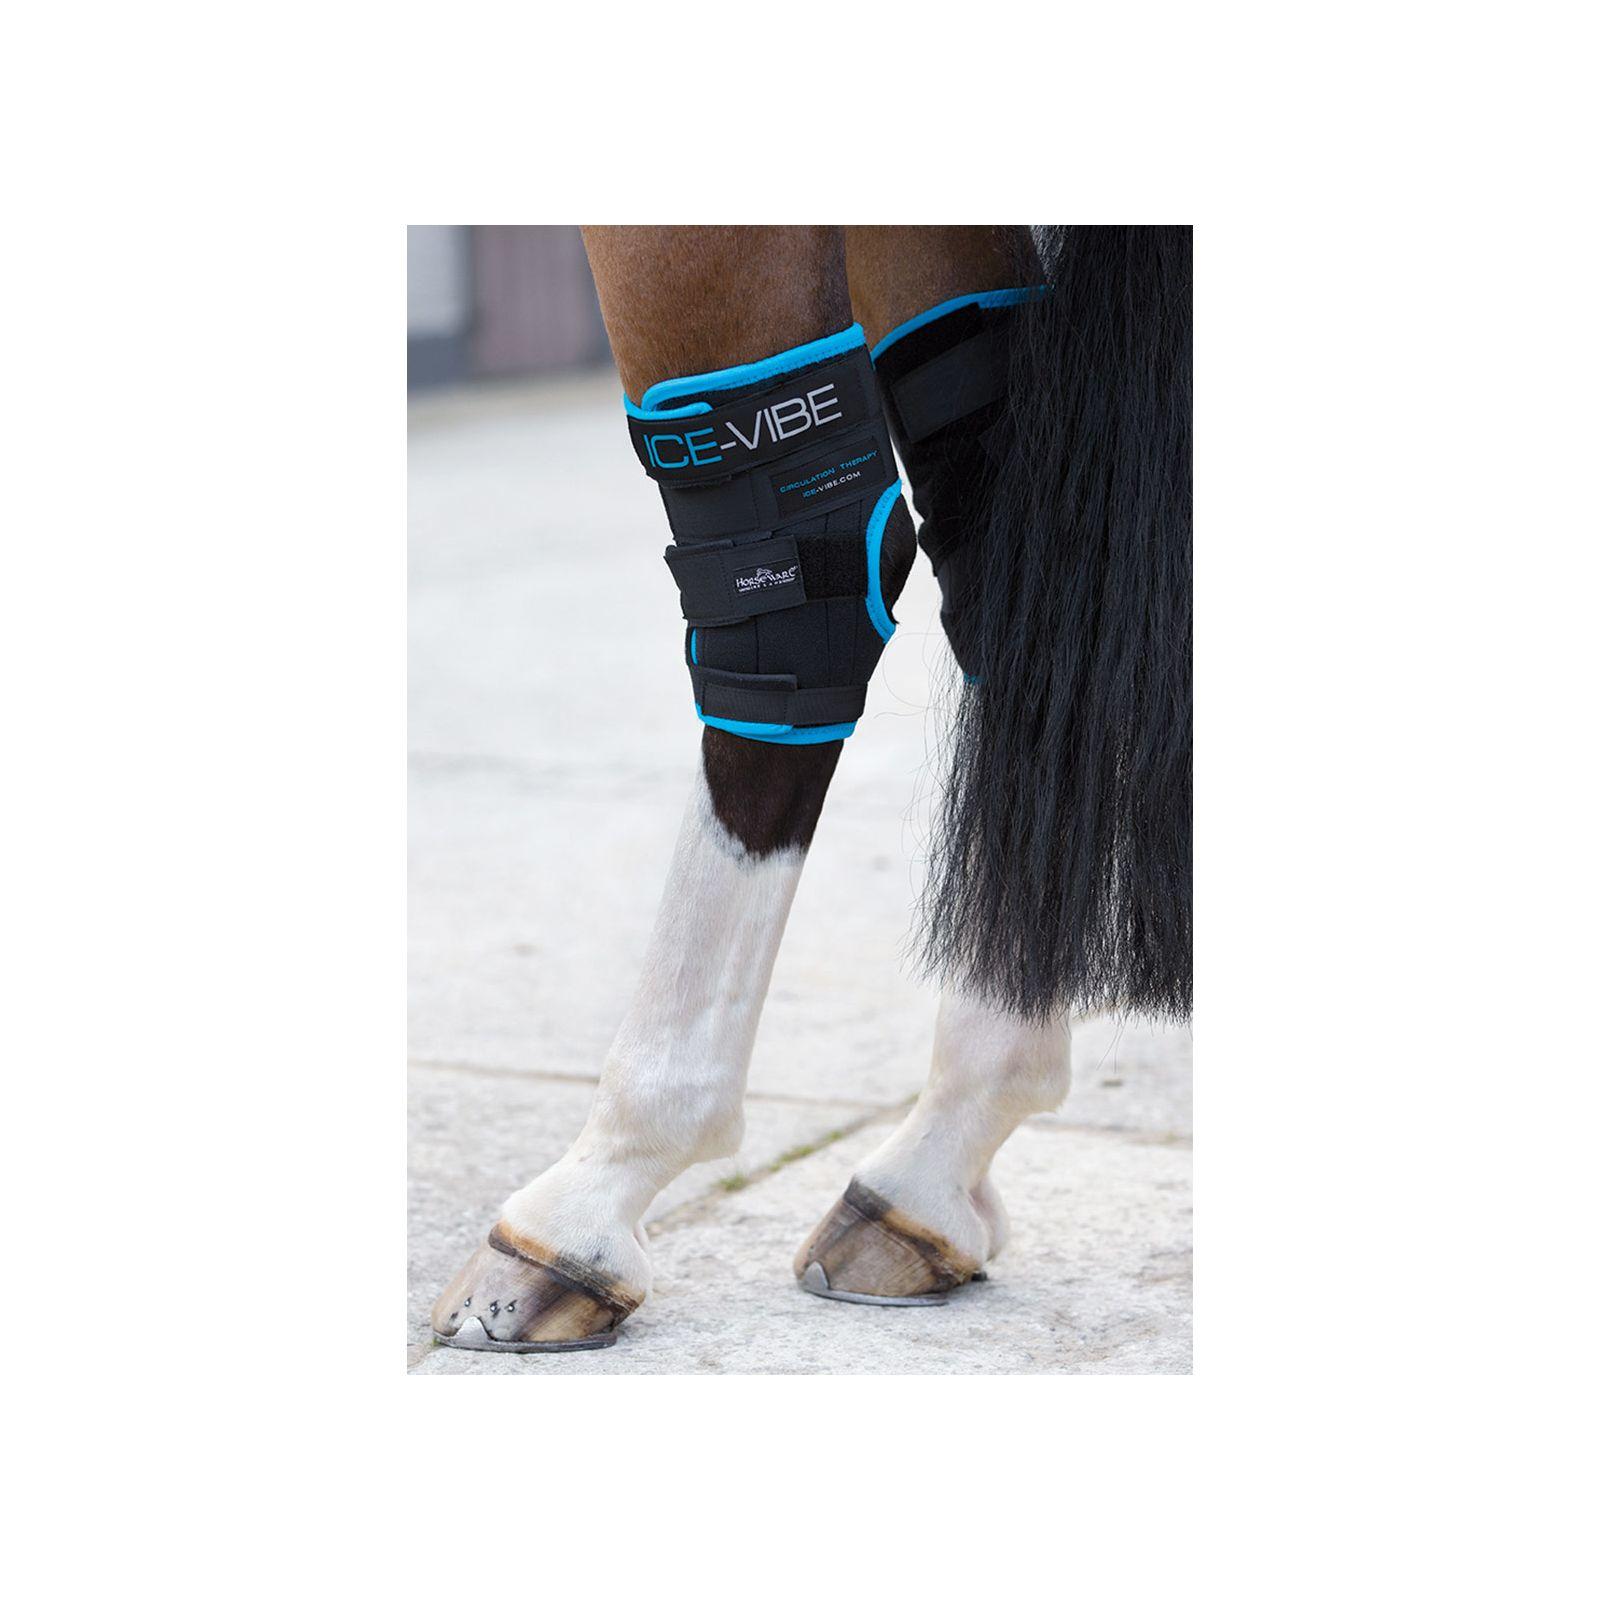 Horseware Ice-Vibe Sprunggelenk-Gamaschen